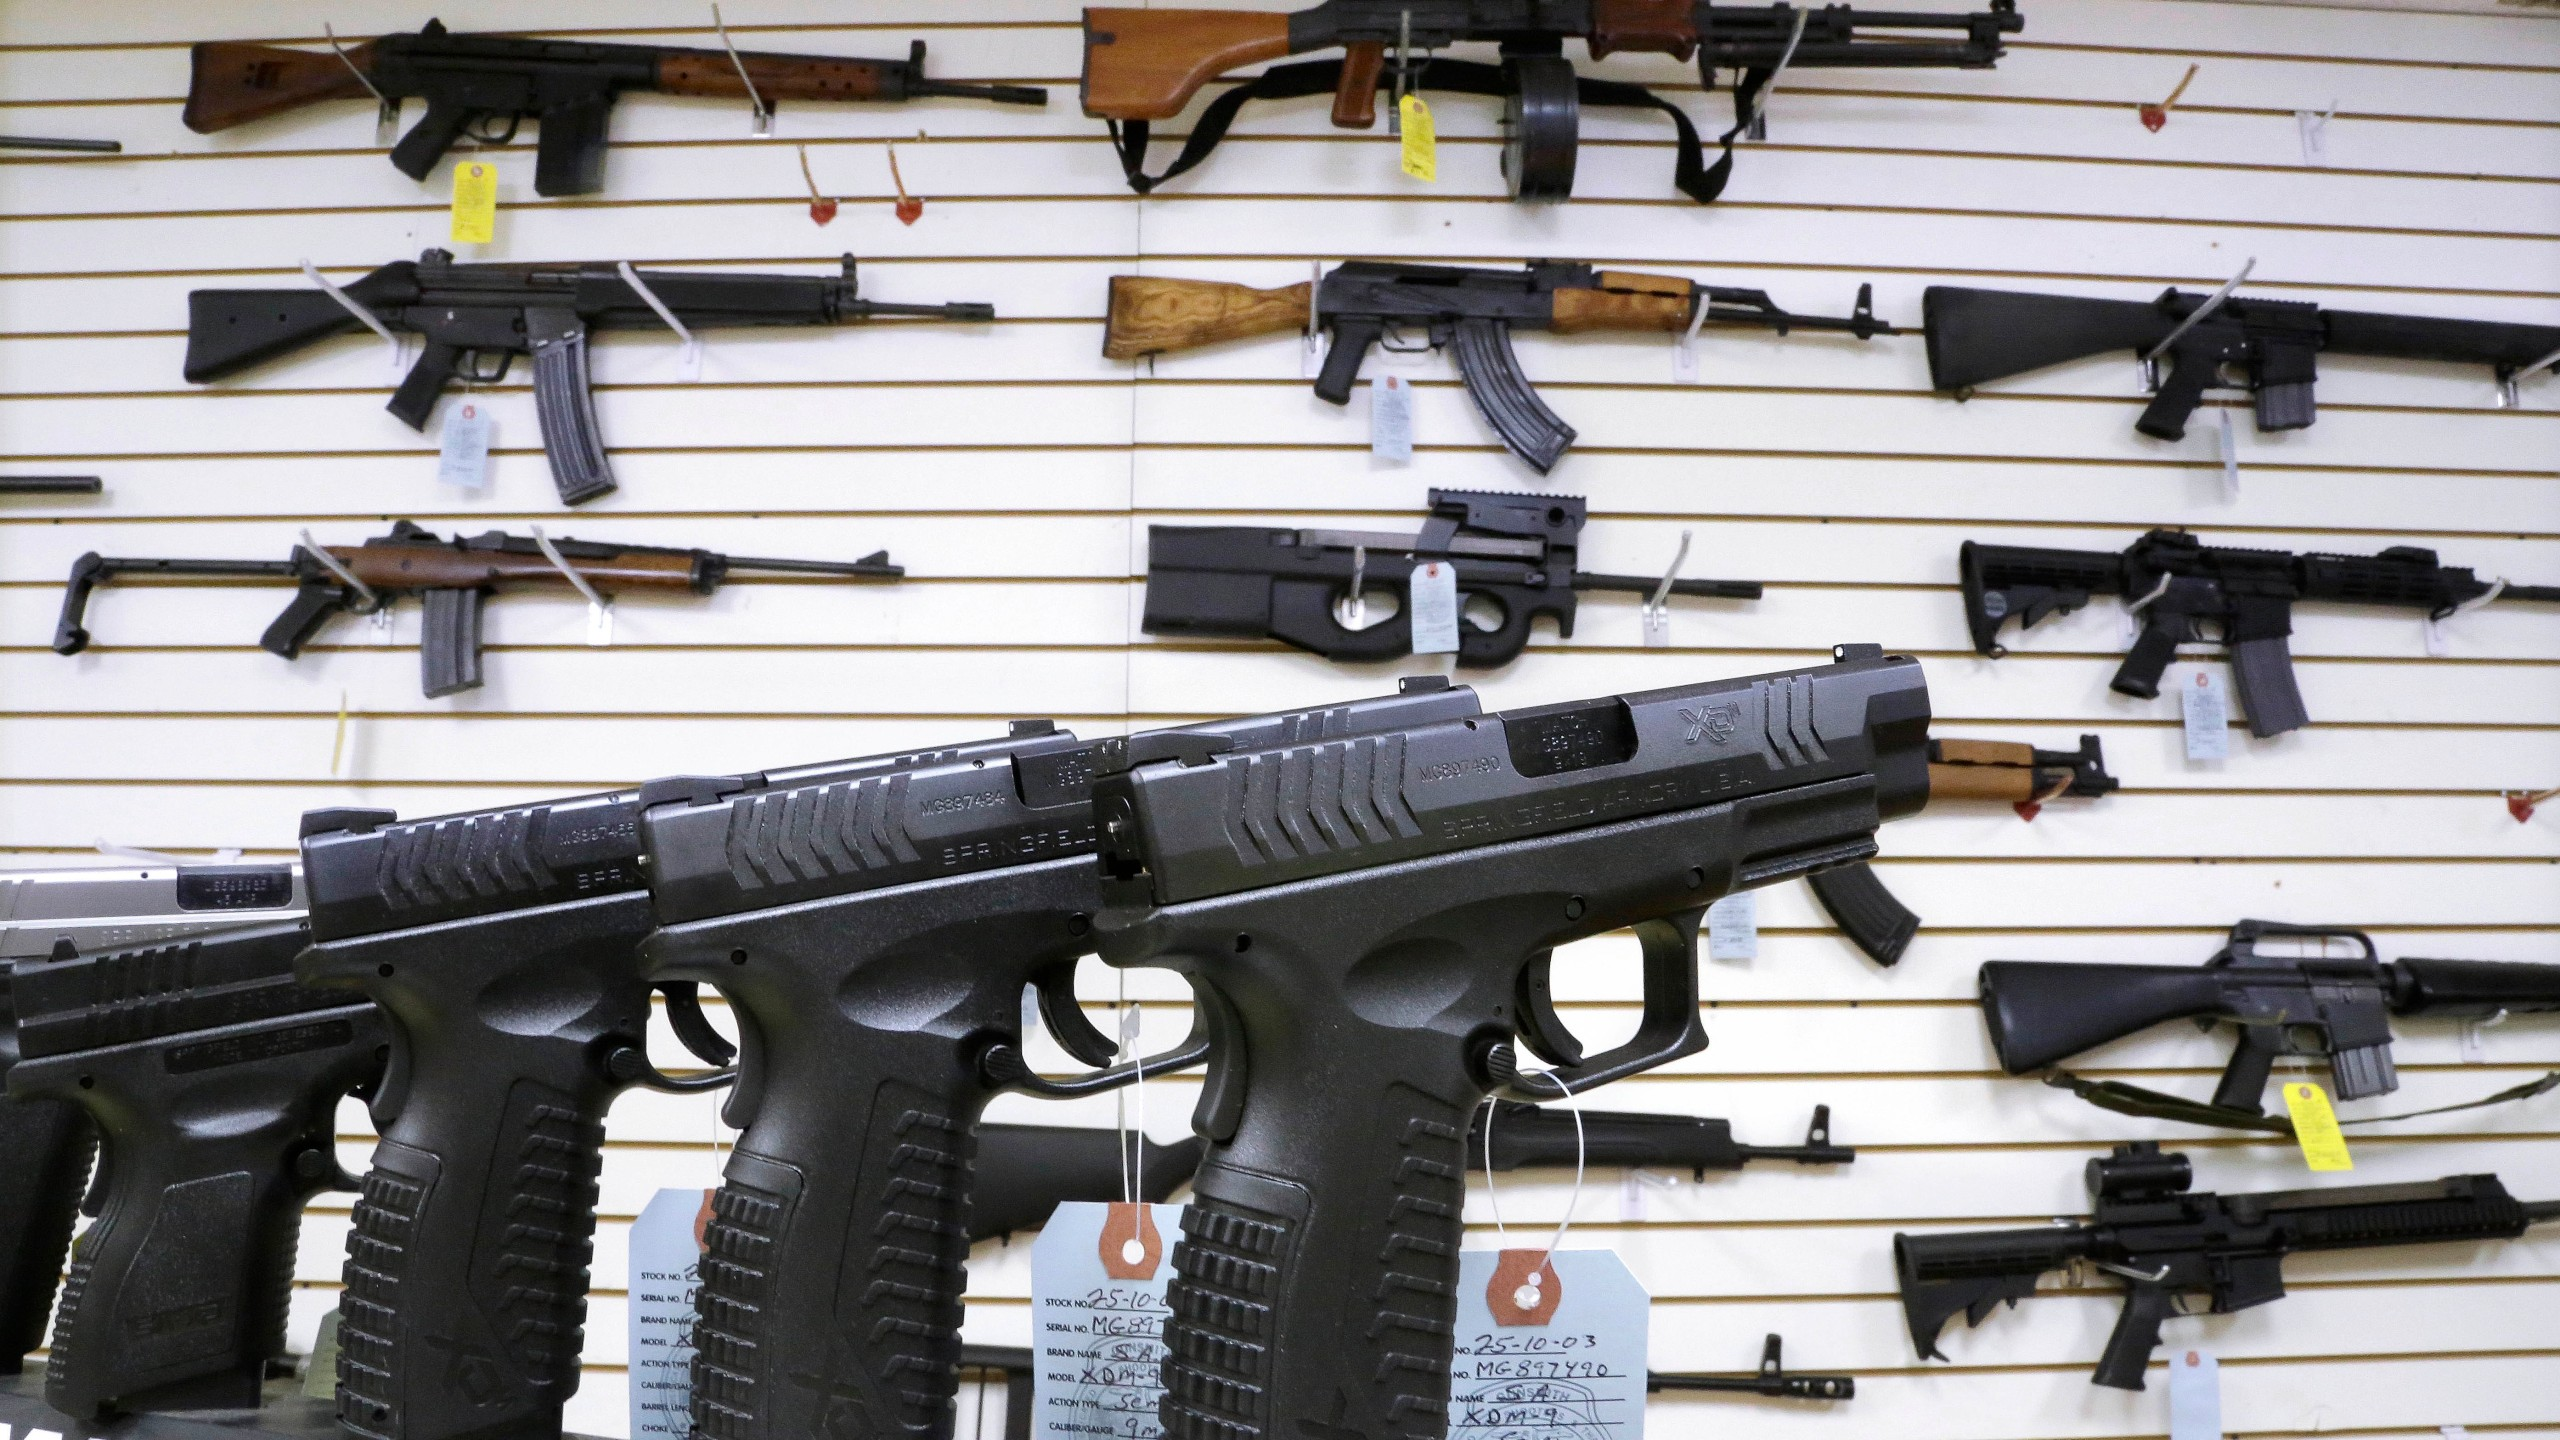 Gun_Background_Checks_89342-159532.jpg49189961